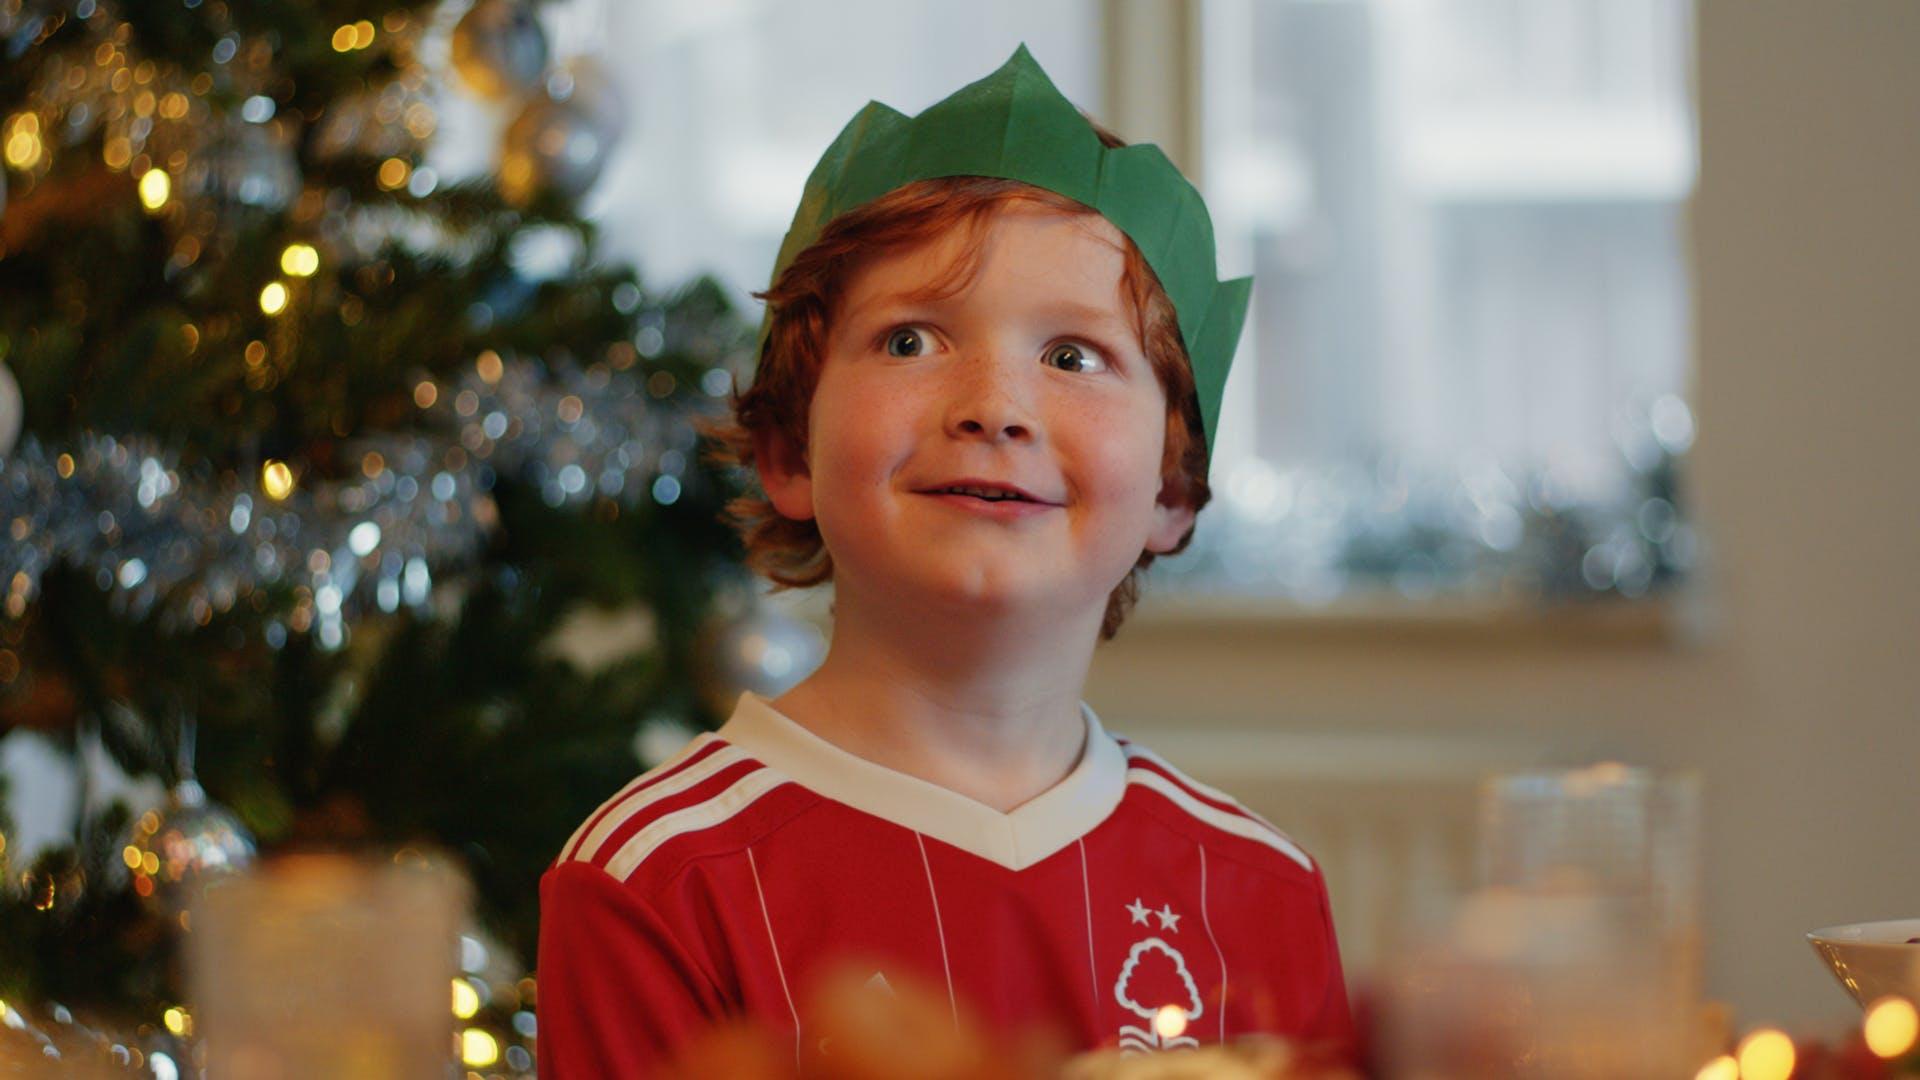 Lidl Christmas campaign 2017